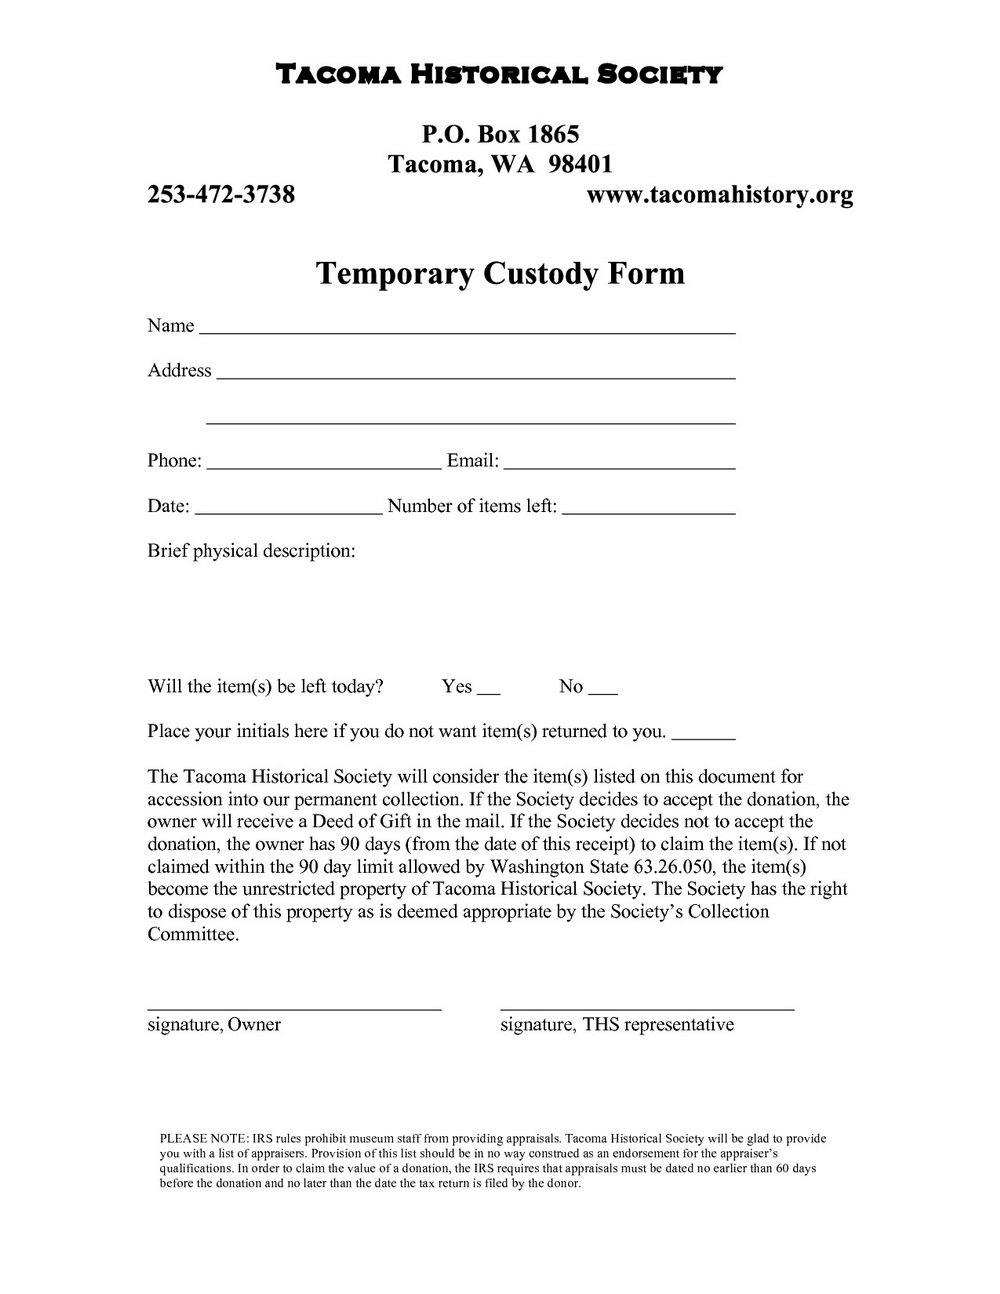 Temporary Guardianship Form Kansas